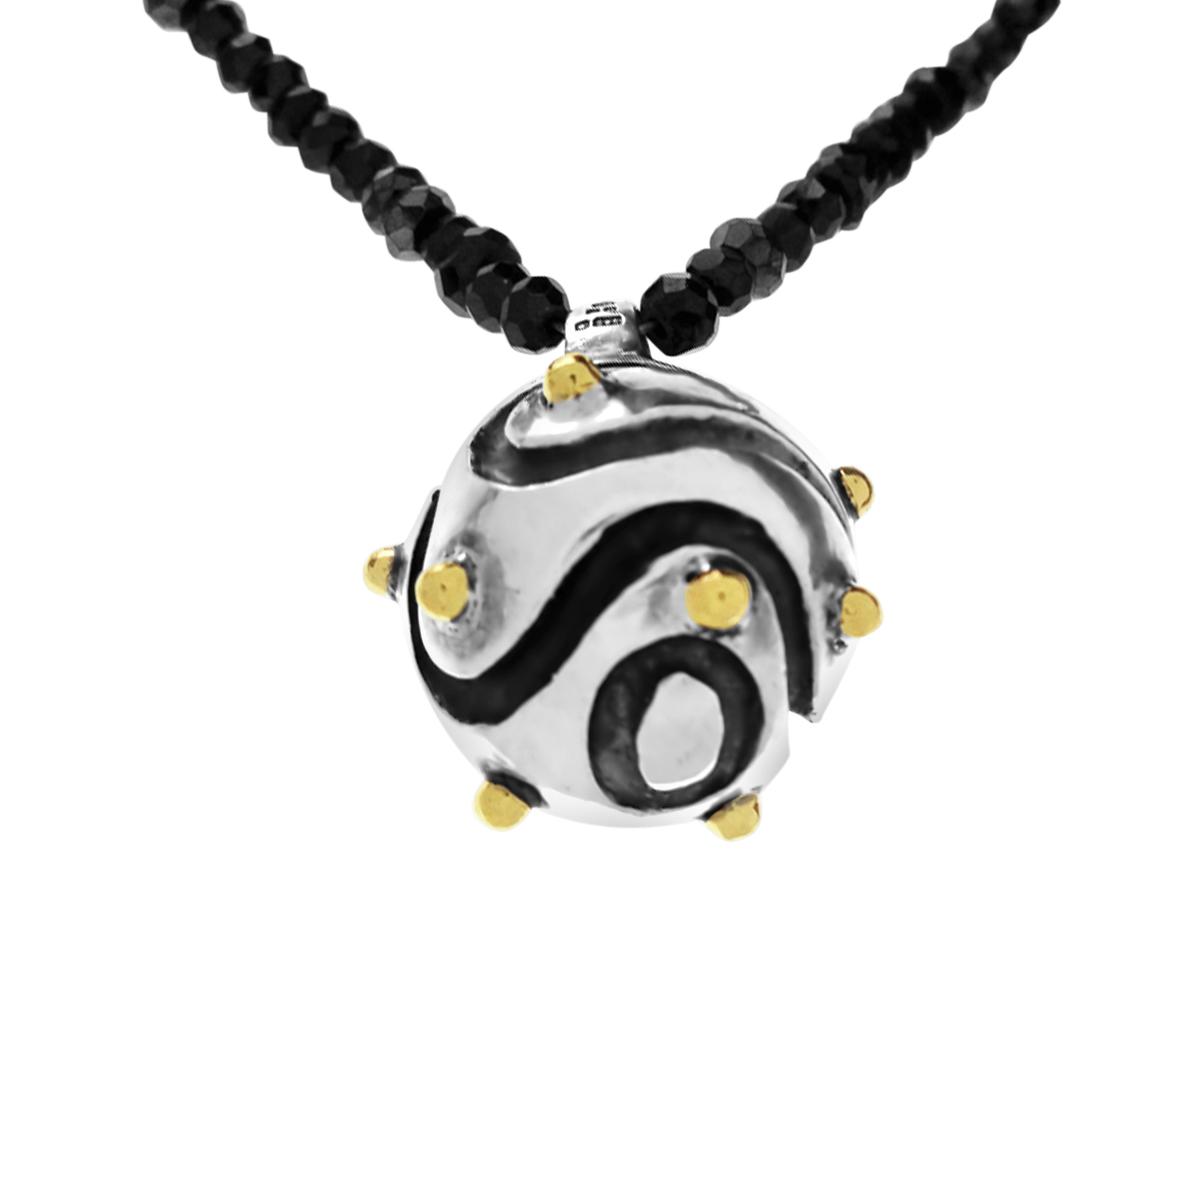 Molecule minesweeper pendant